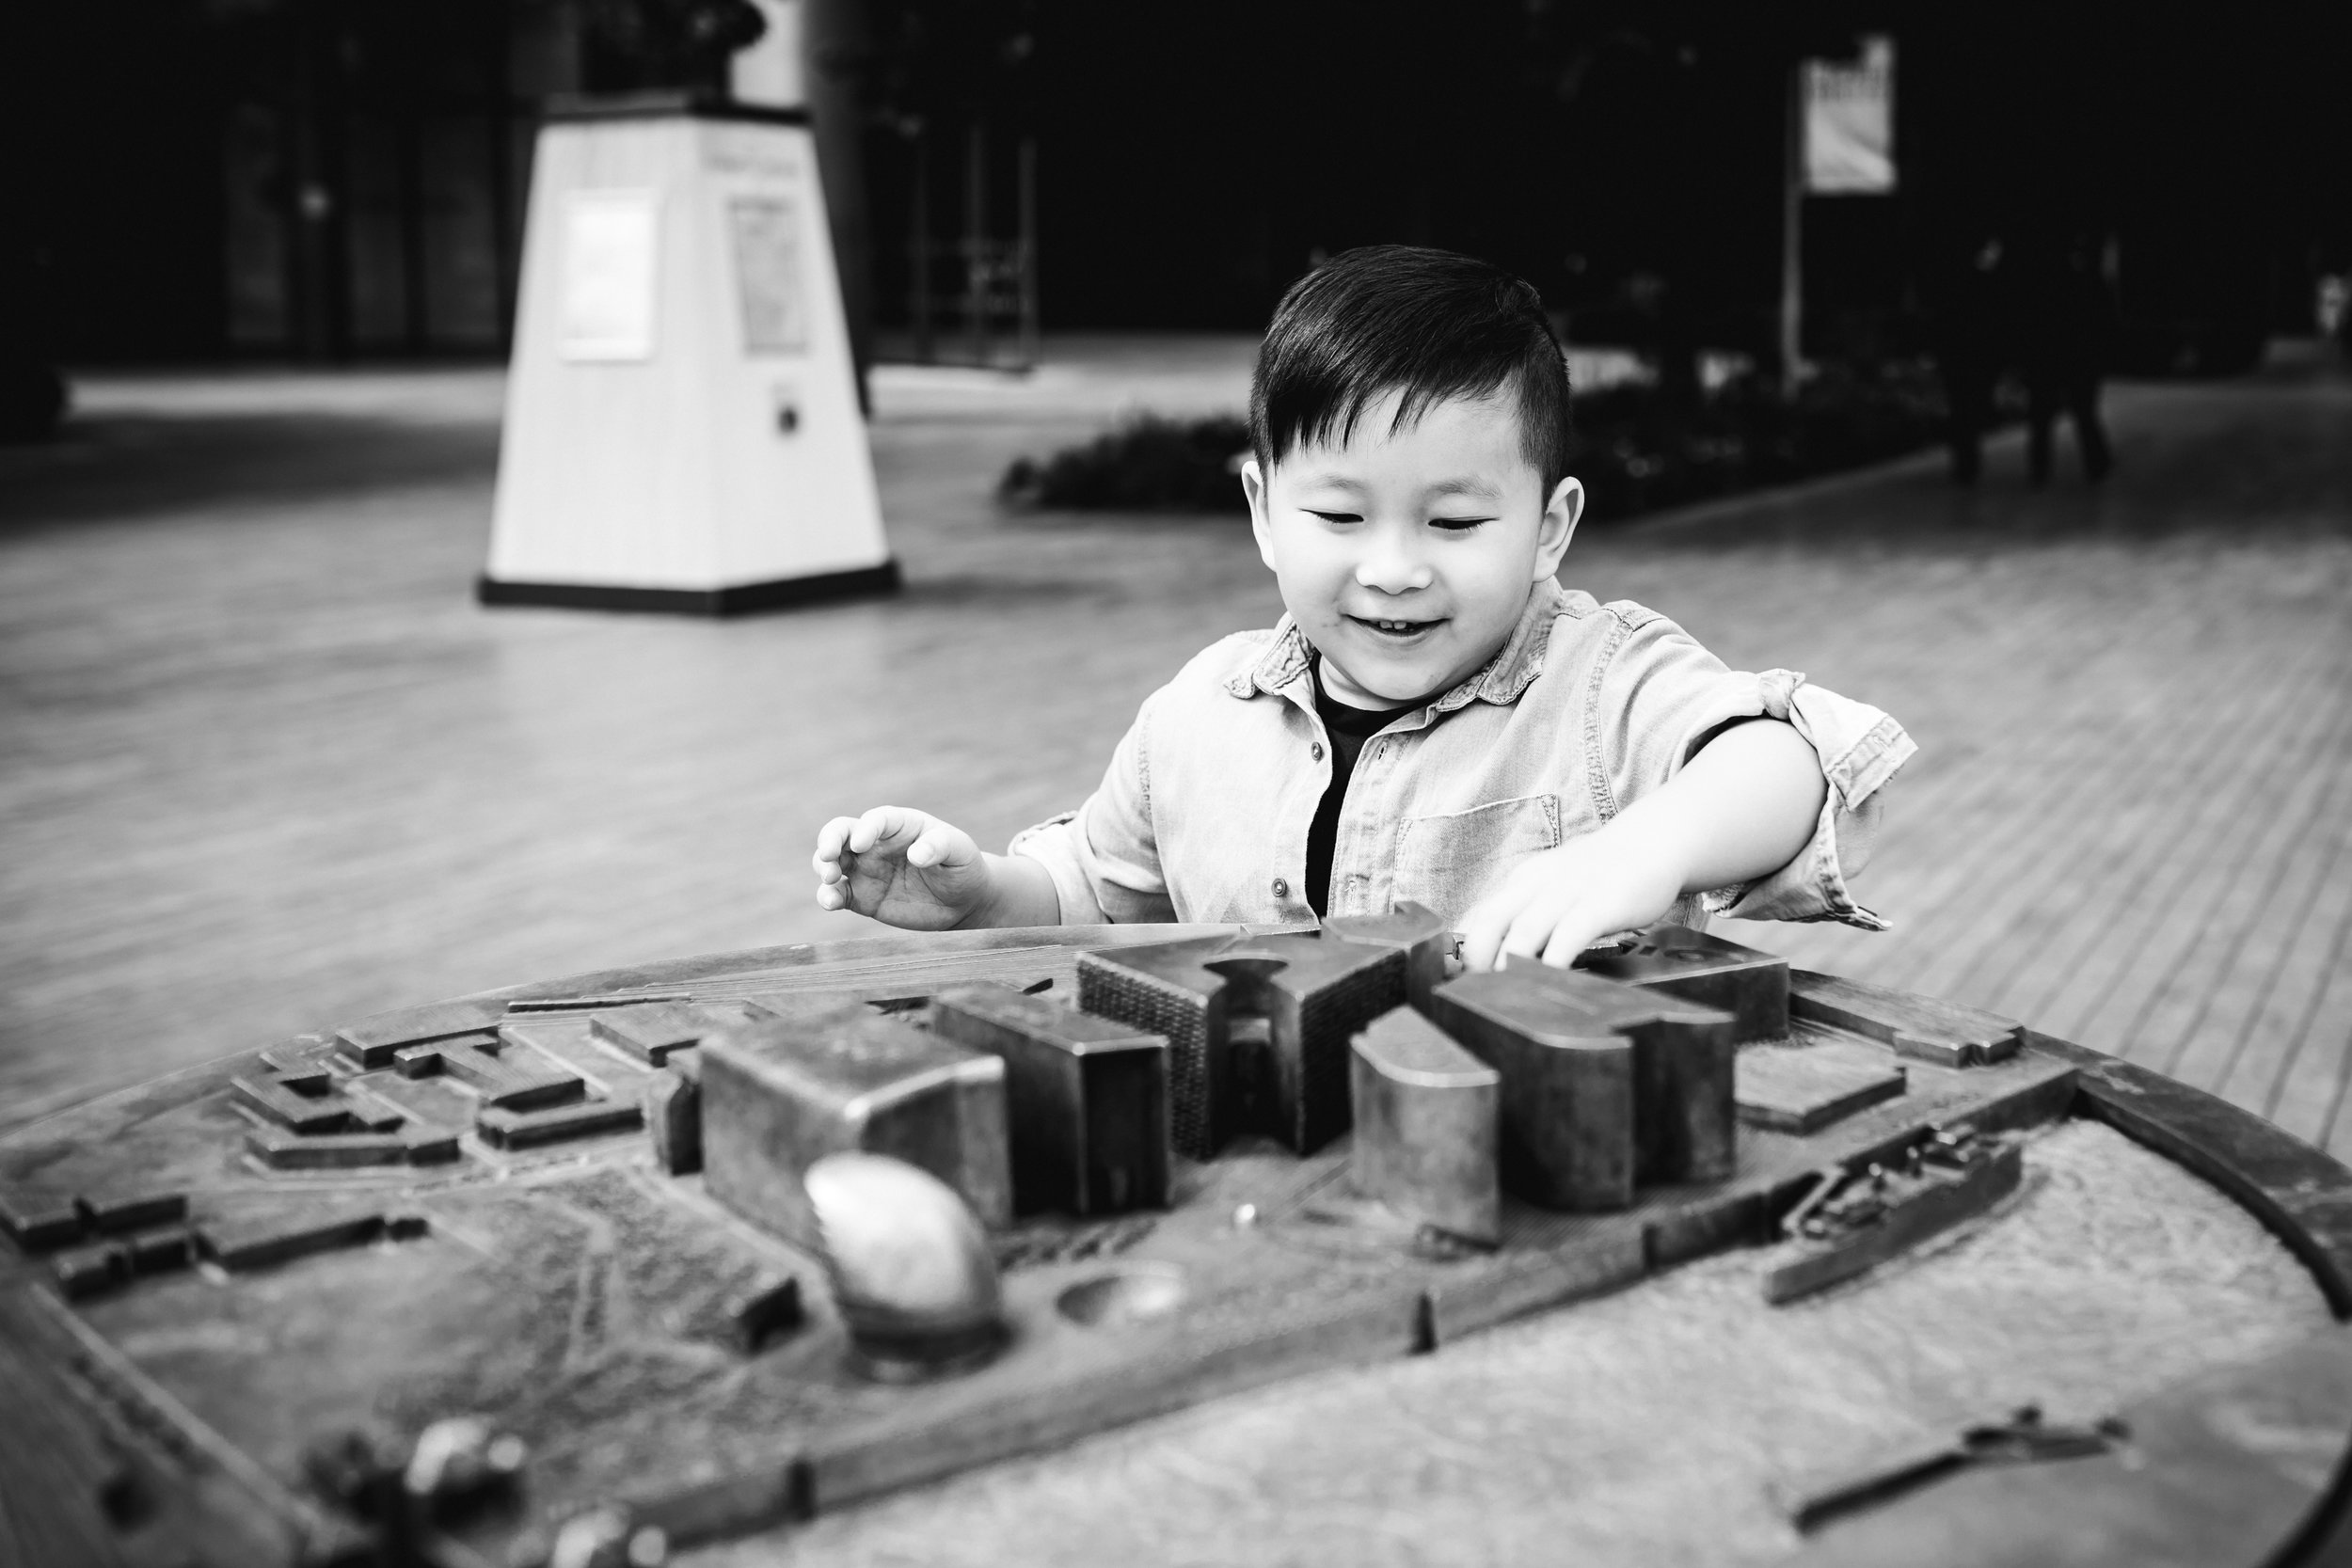 Child near Tower Bridge - London Holiday Photography